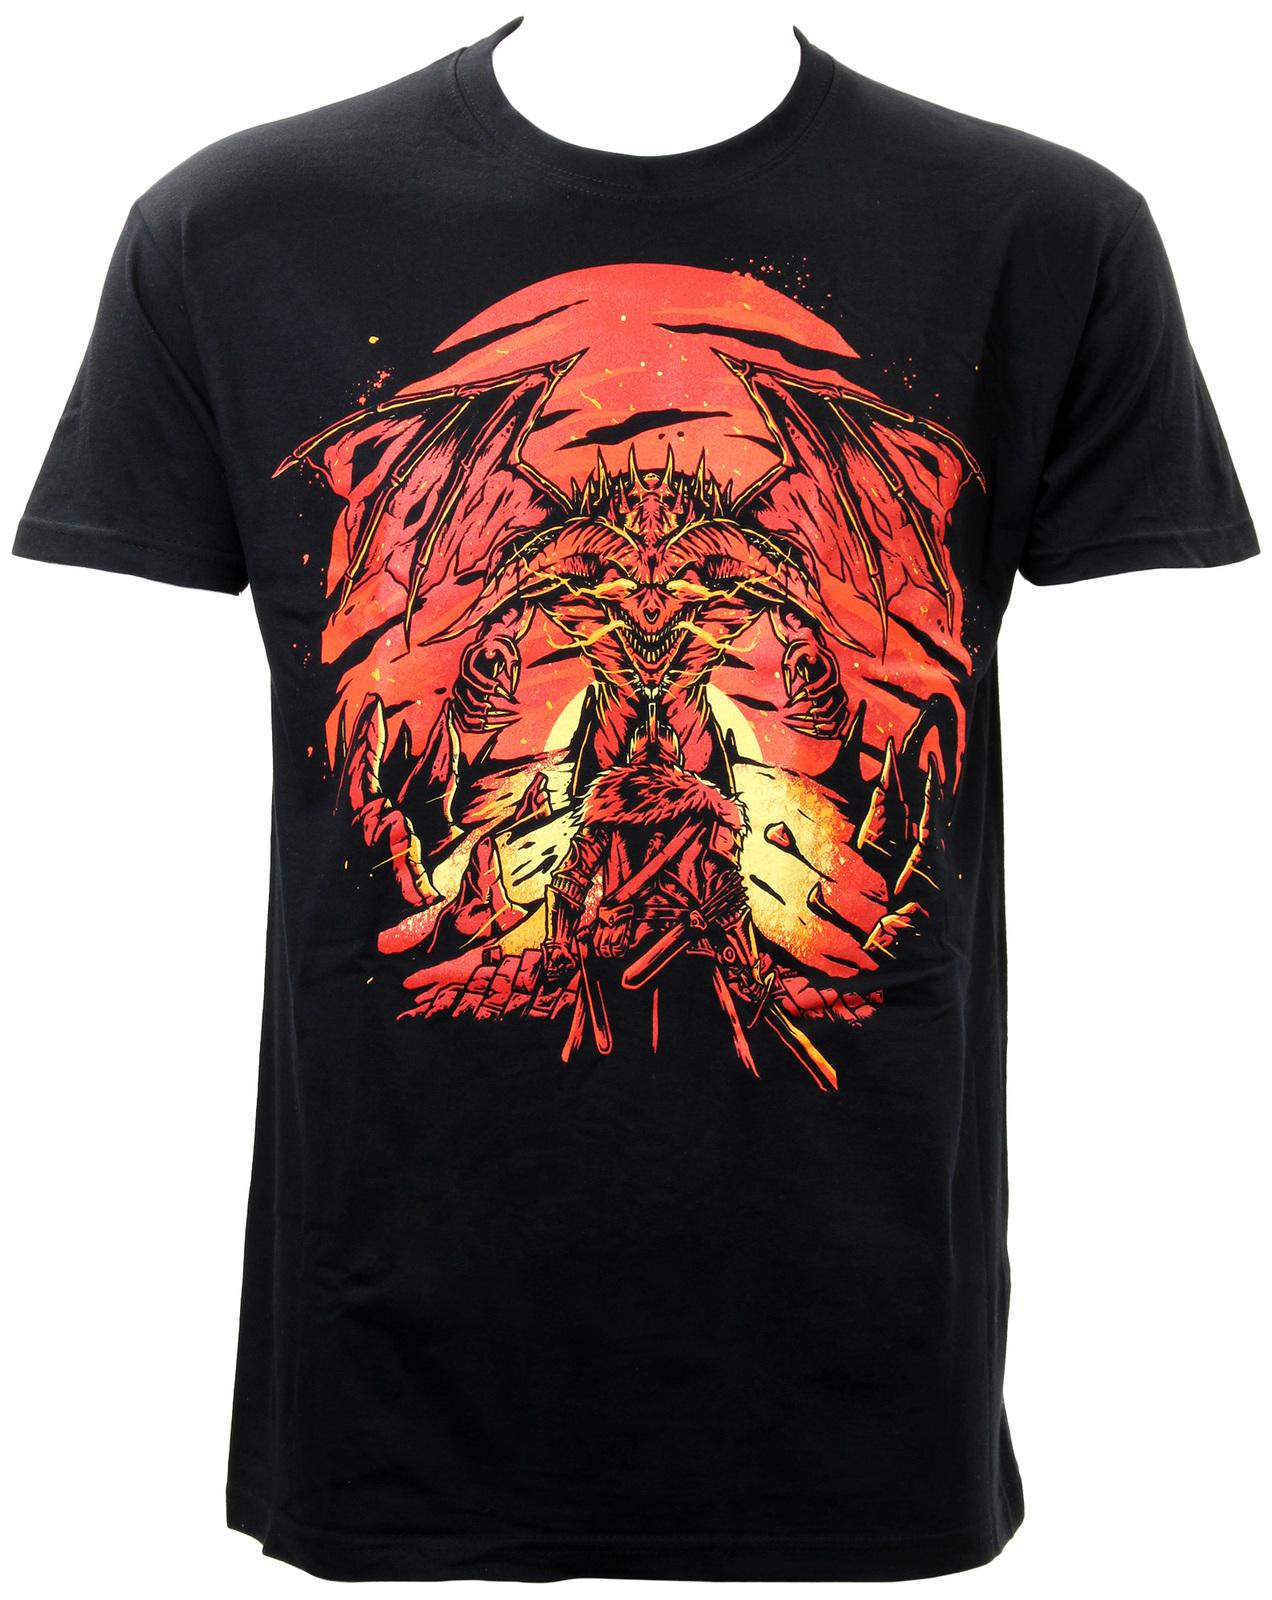 Dark Souls 3 Dragon T-Shirt (Large) image